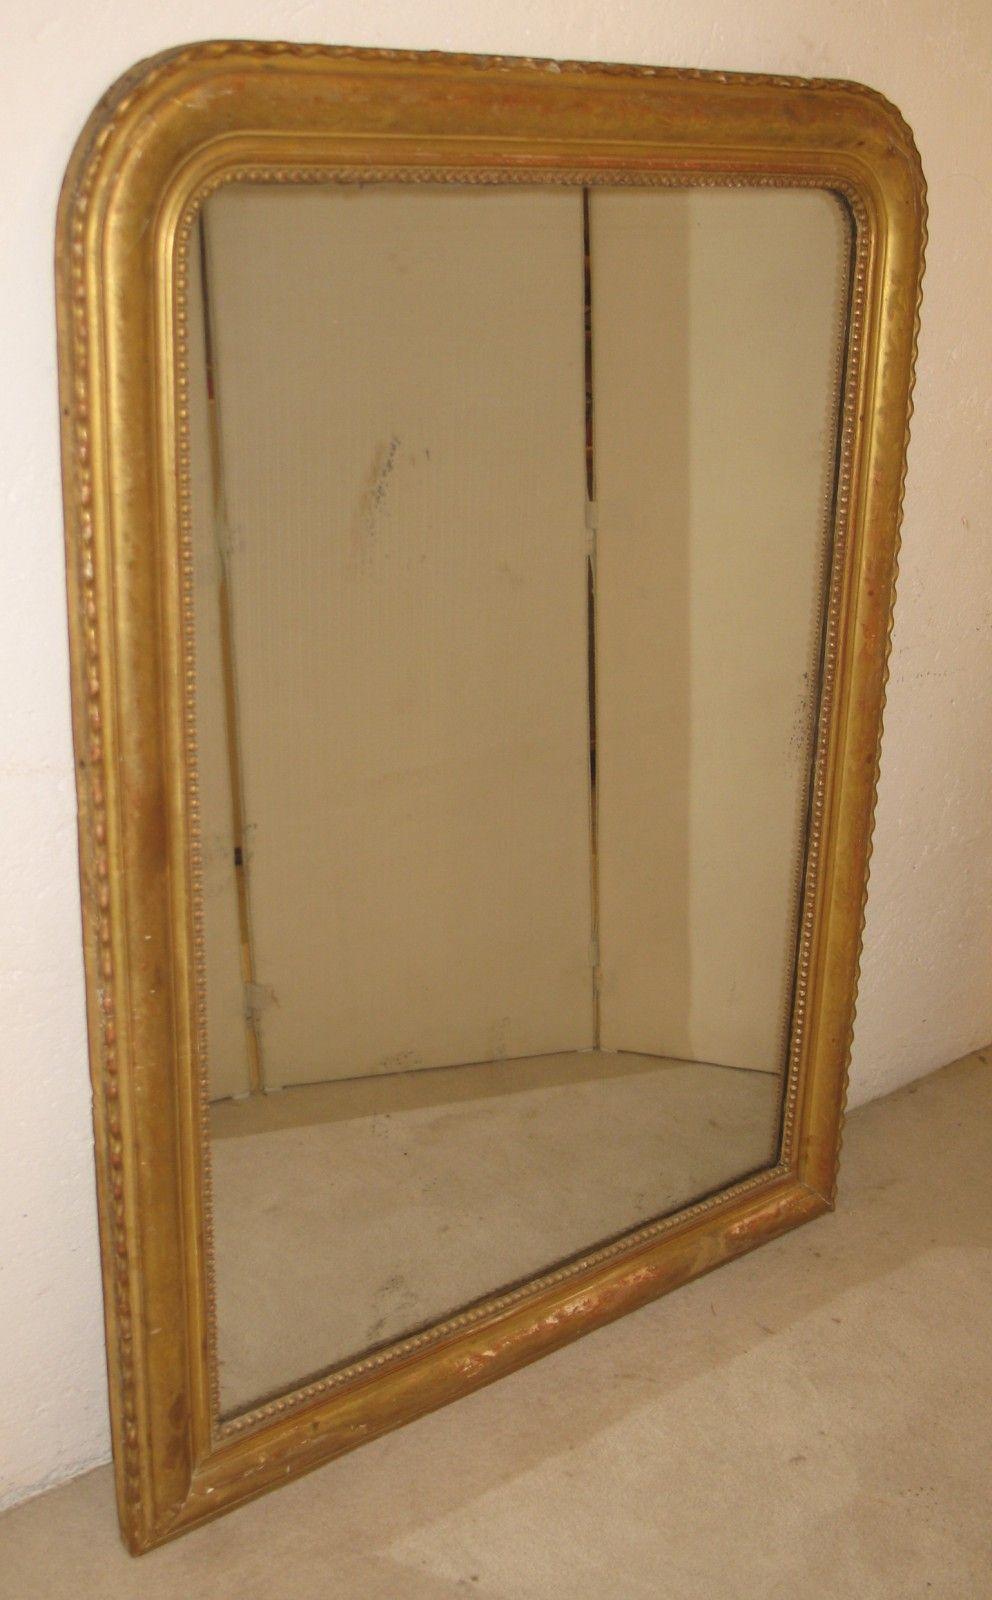 grand miroir louis philippe avec cadre bois dore epoque 19eme siecle